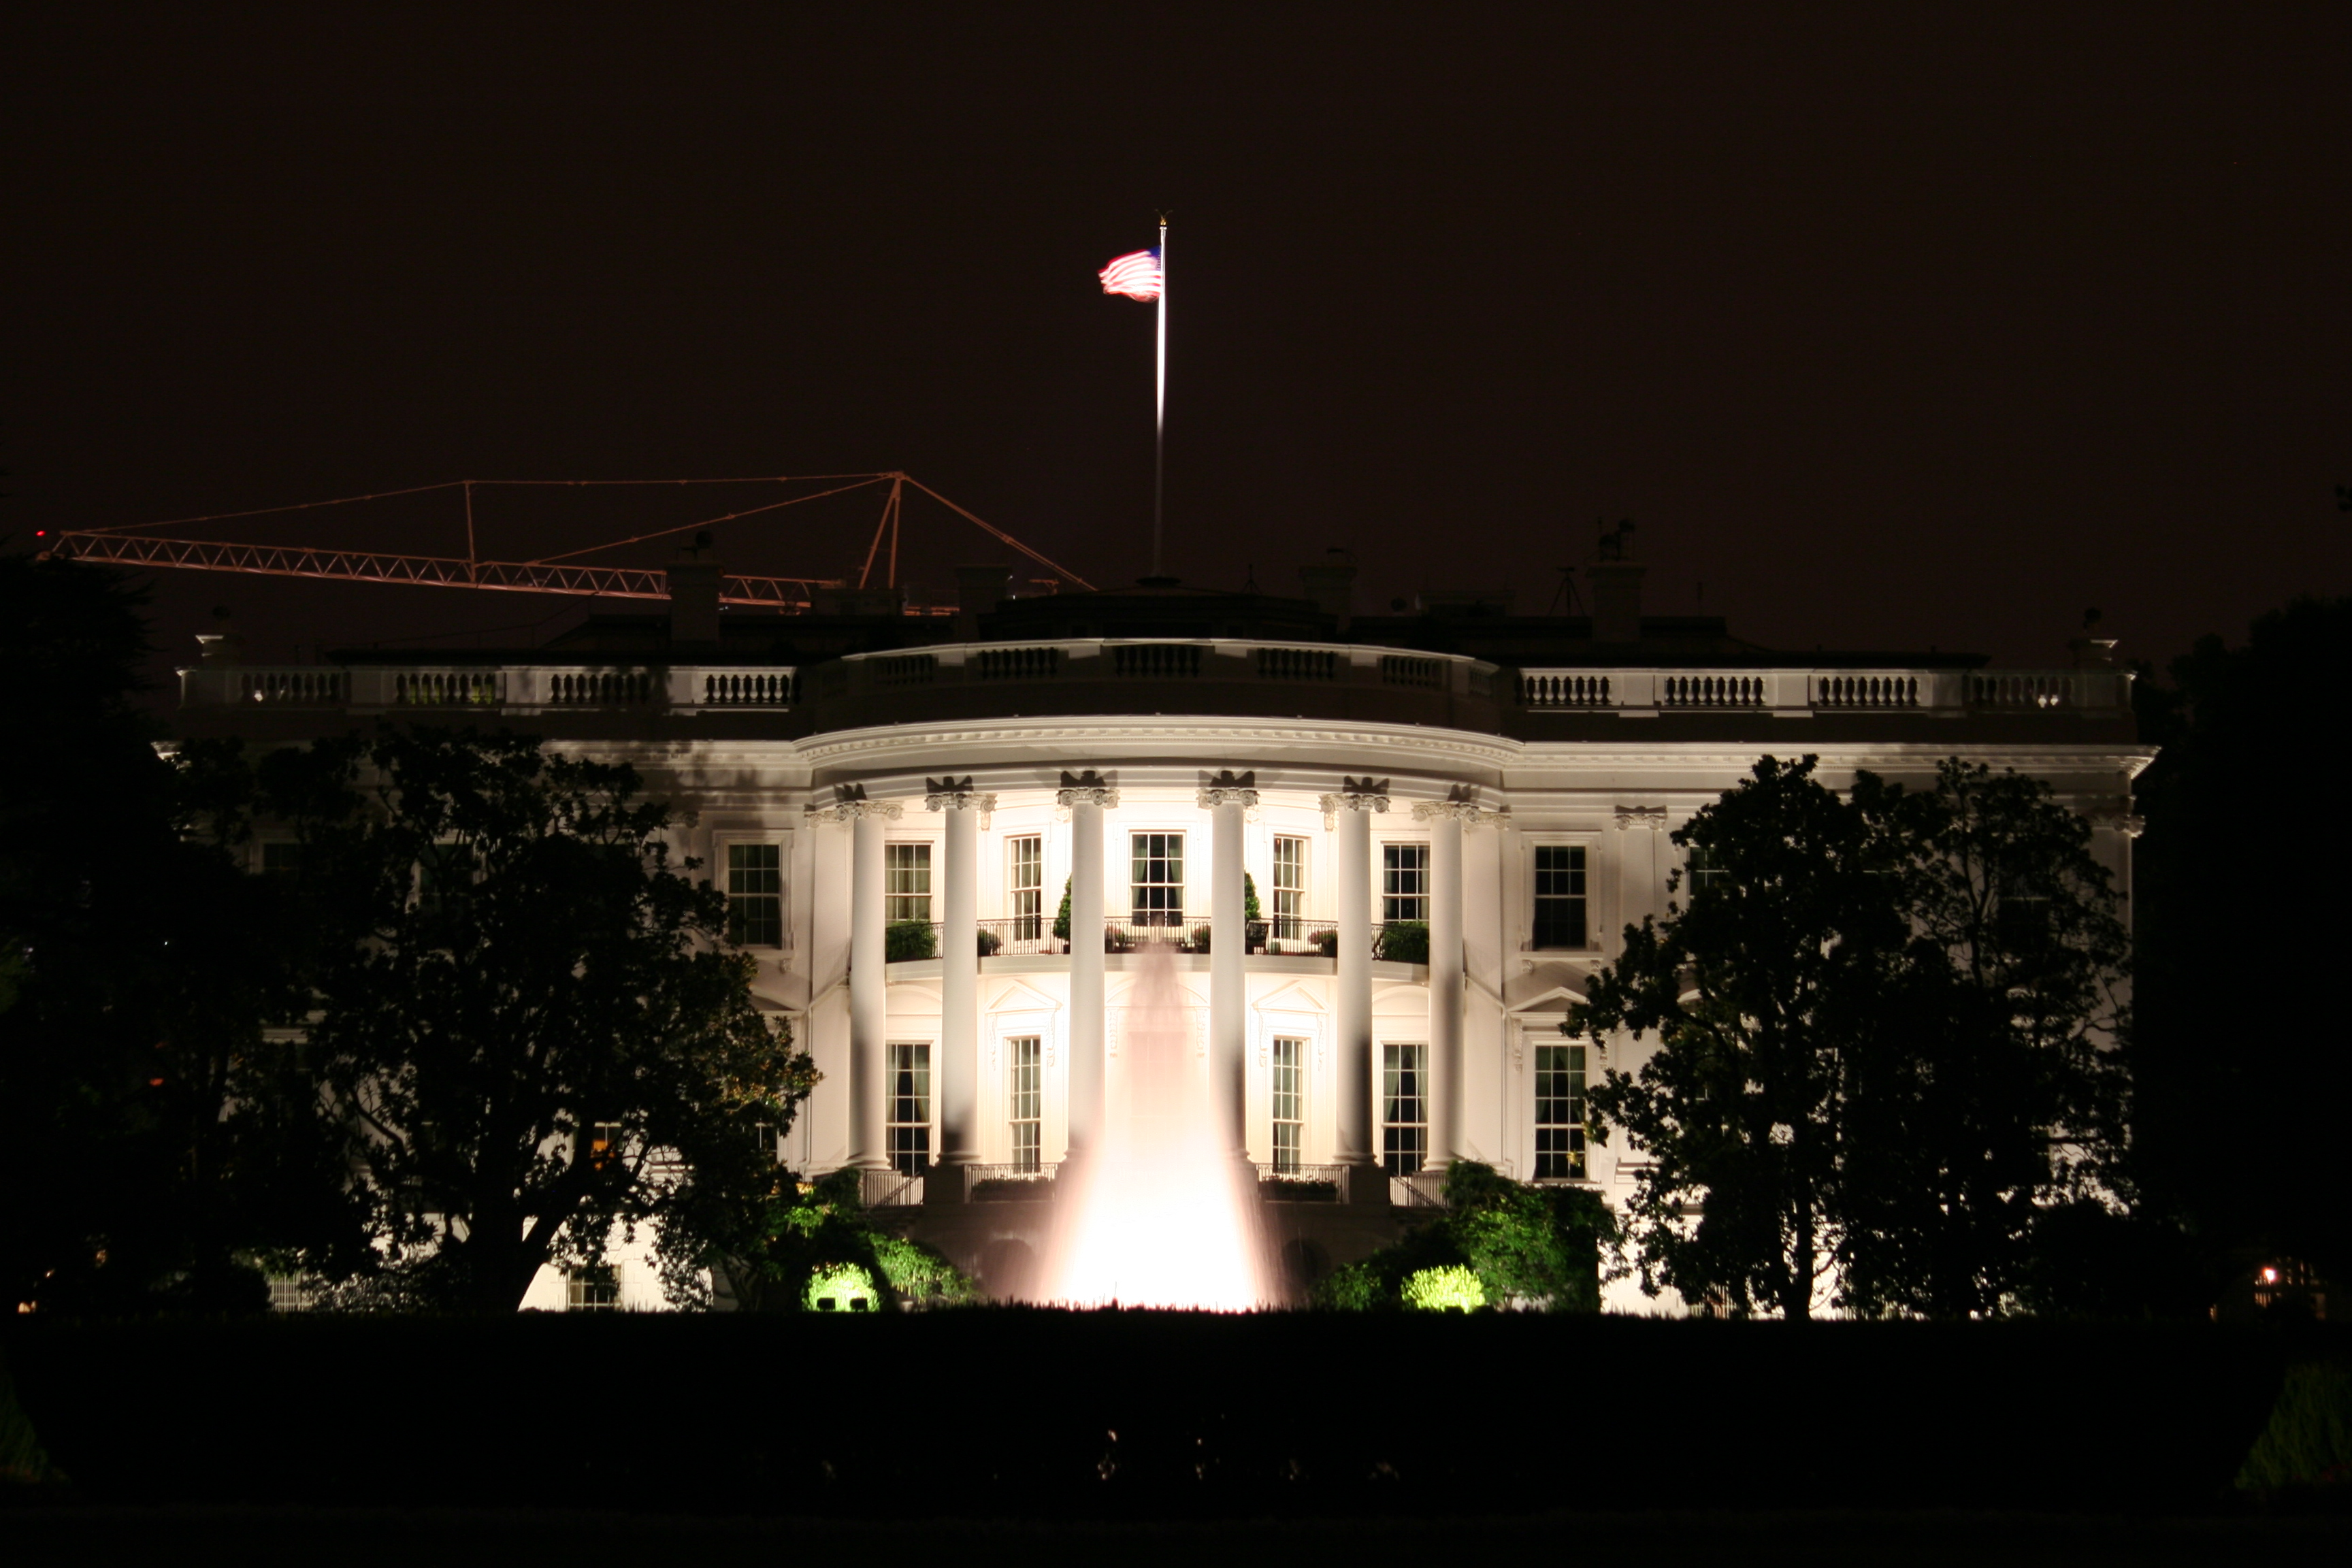 U.S. Sanctions 17 Saudi Individuals Over Their Role In Khashoggi Murder